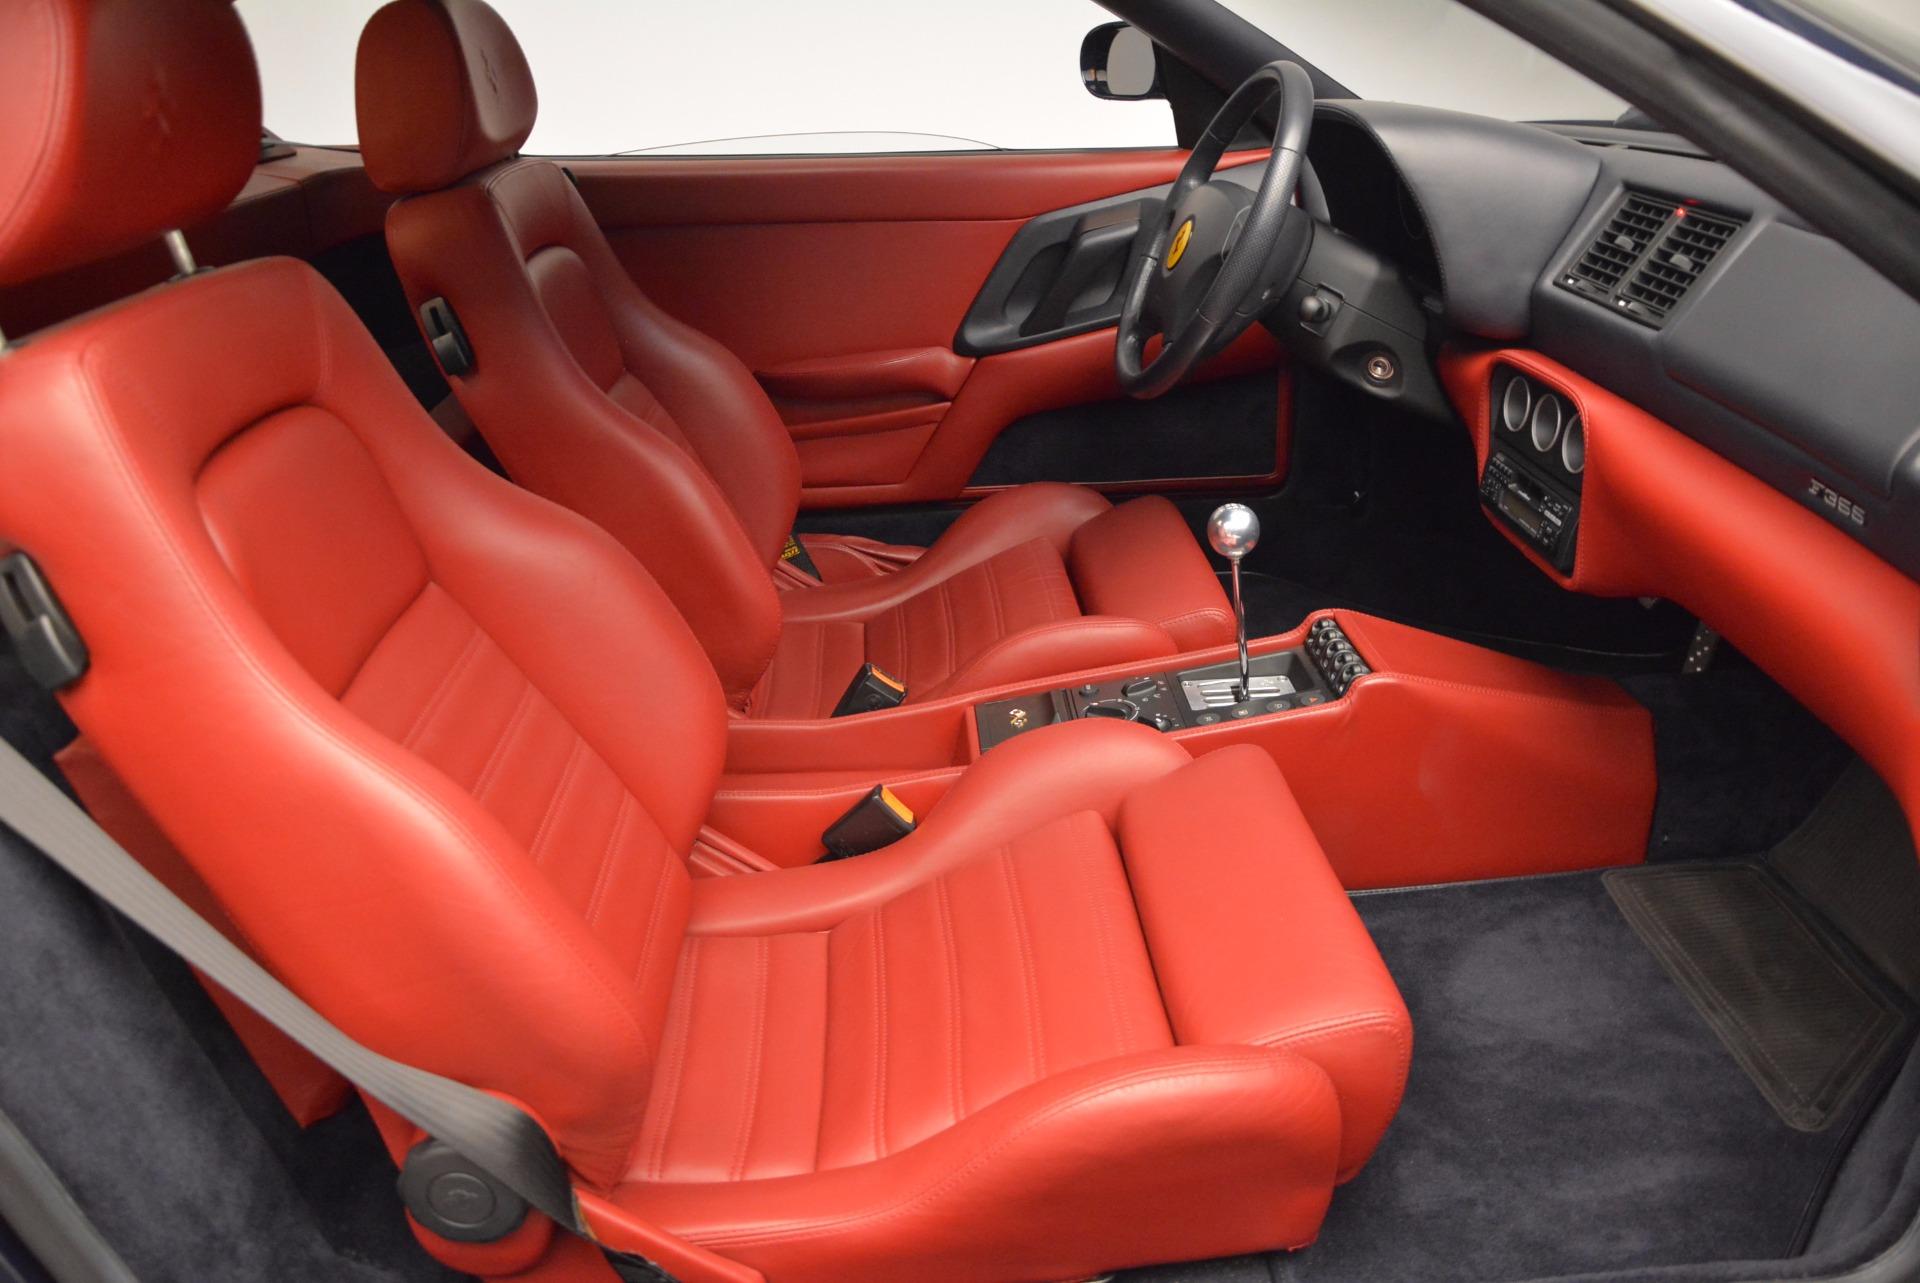 Used 1999 Ferrari 355 Berlinetta For Sale In Westport, CT 855_p19